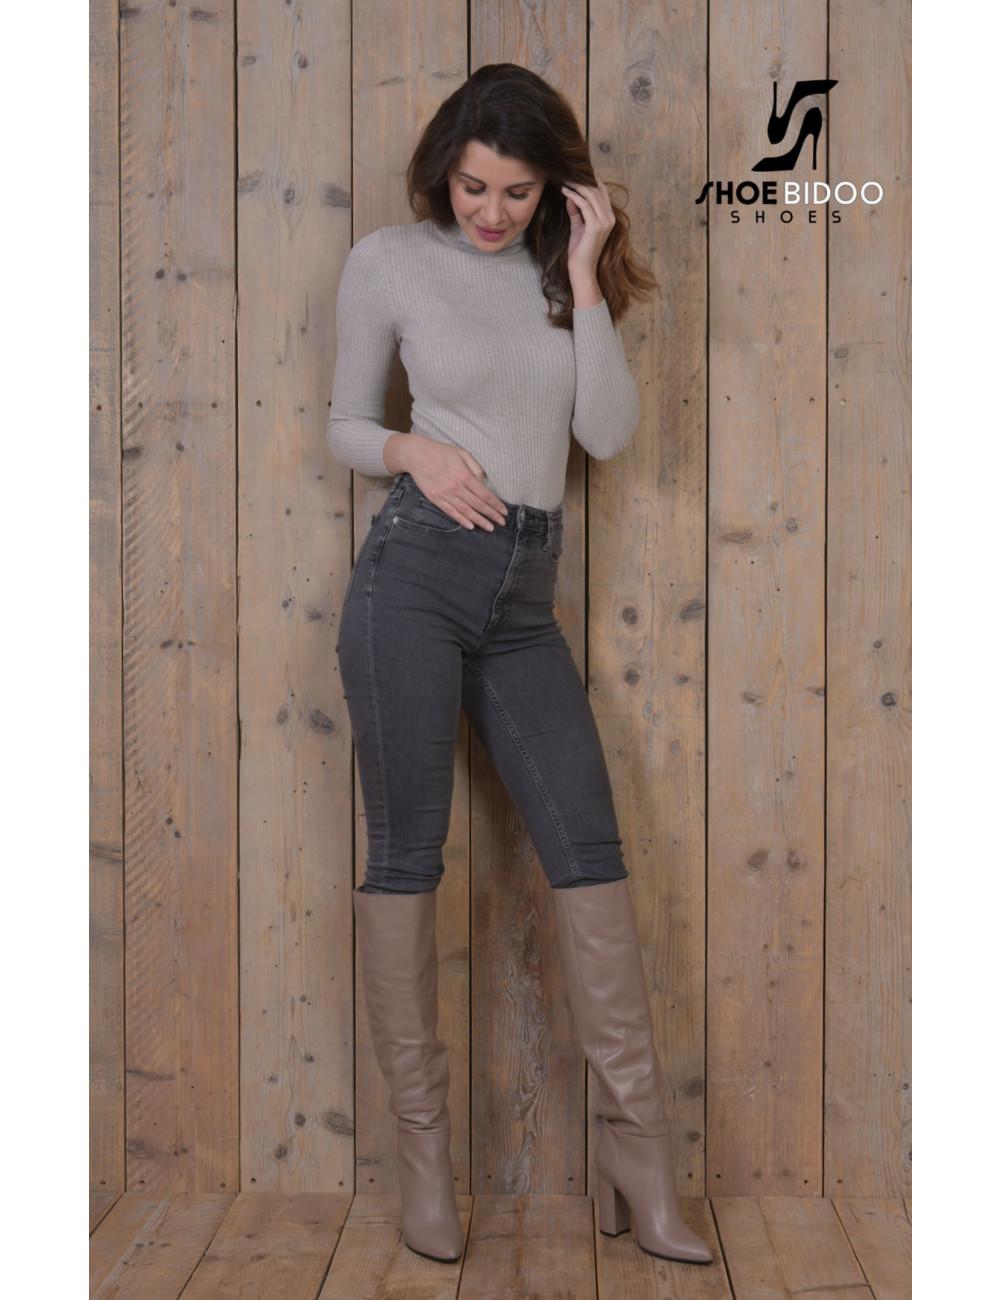 Sanctum Shoes Olga in Italiaanse leren knielaarzen